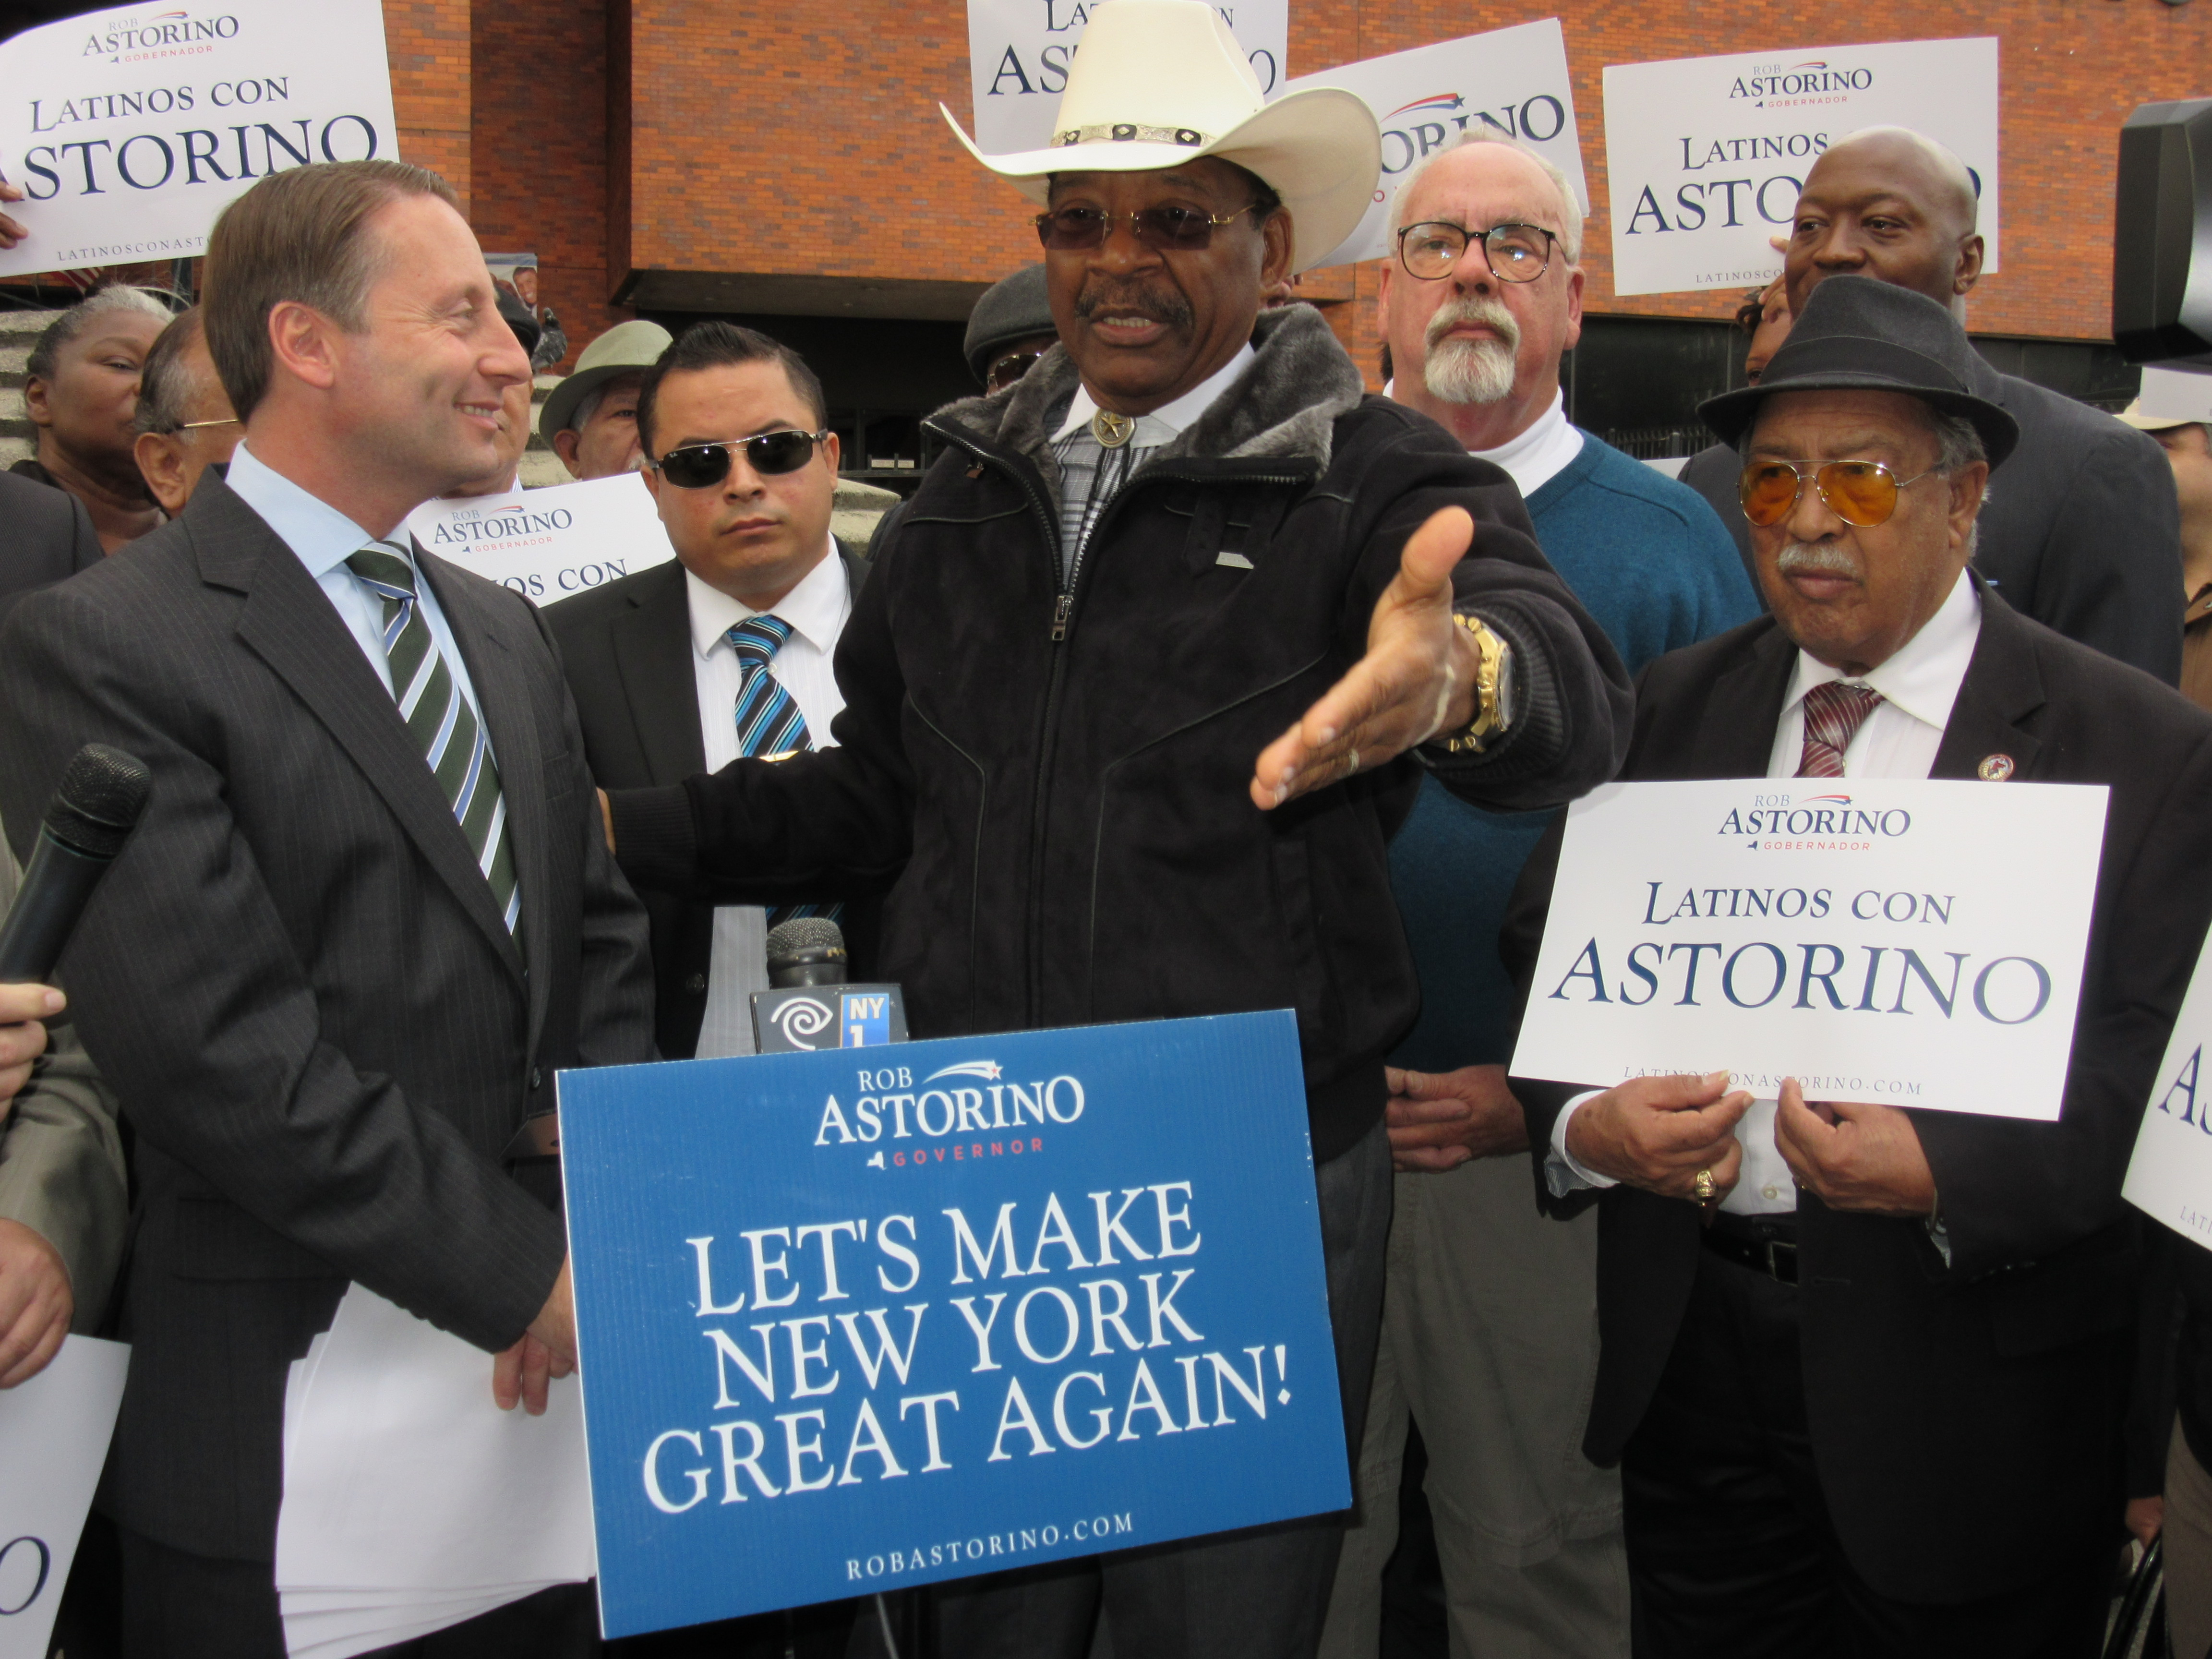 State Senator Ruben Diaz Jr., center, presents Westchester County Executive Rob Astorino, left, surrounded by Hispanic pastors and former GOP comptroller candidate John Burnett, back right.